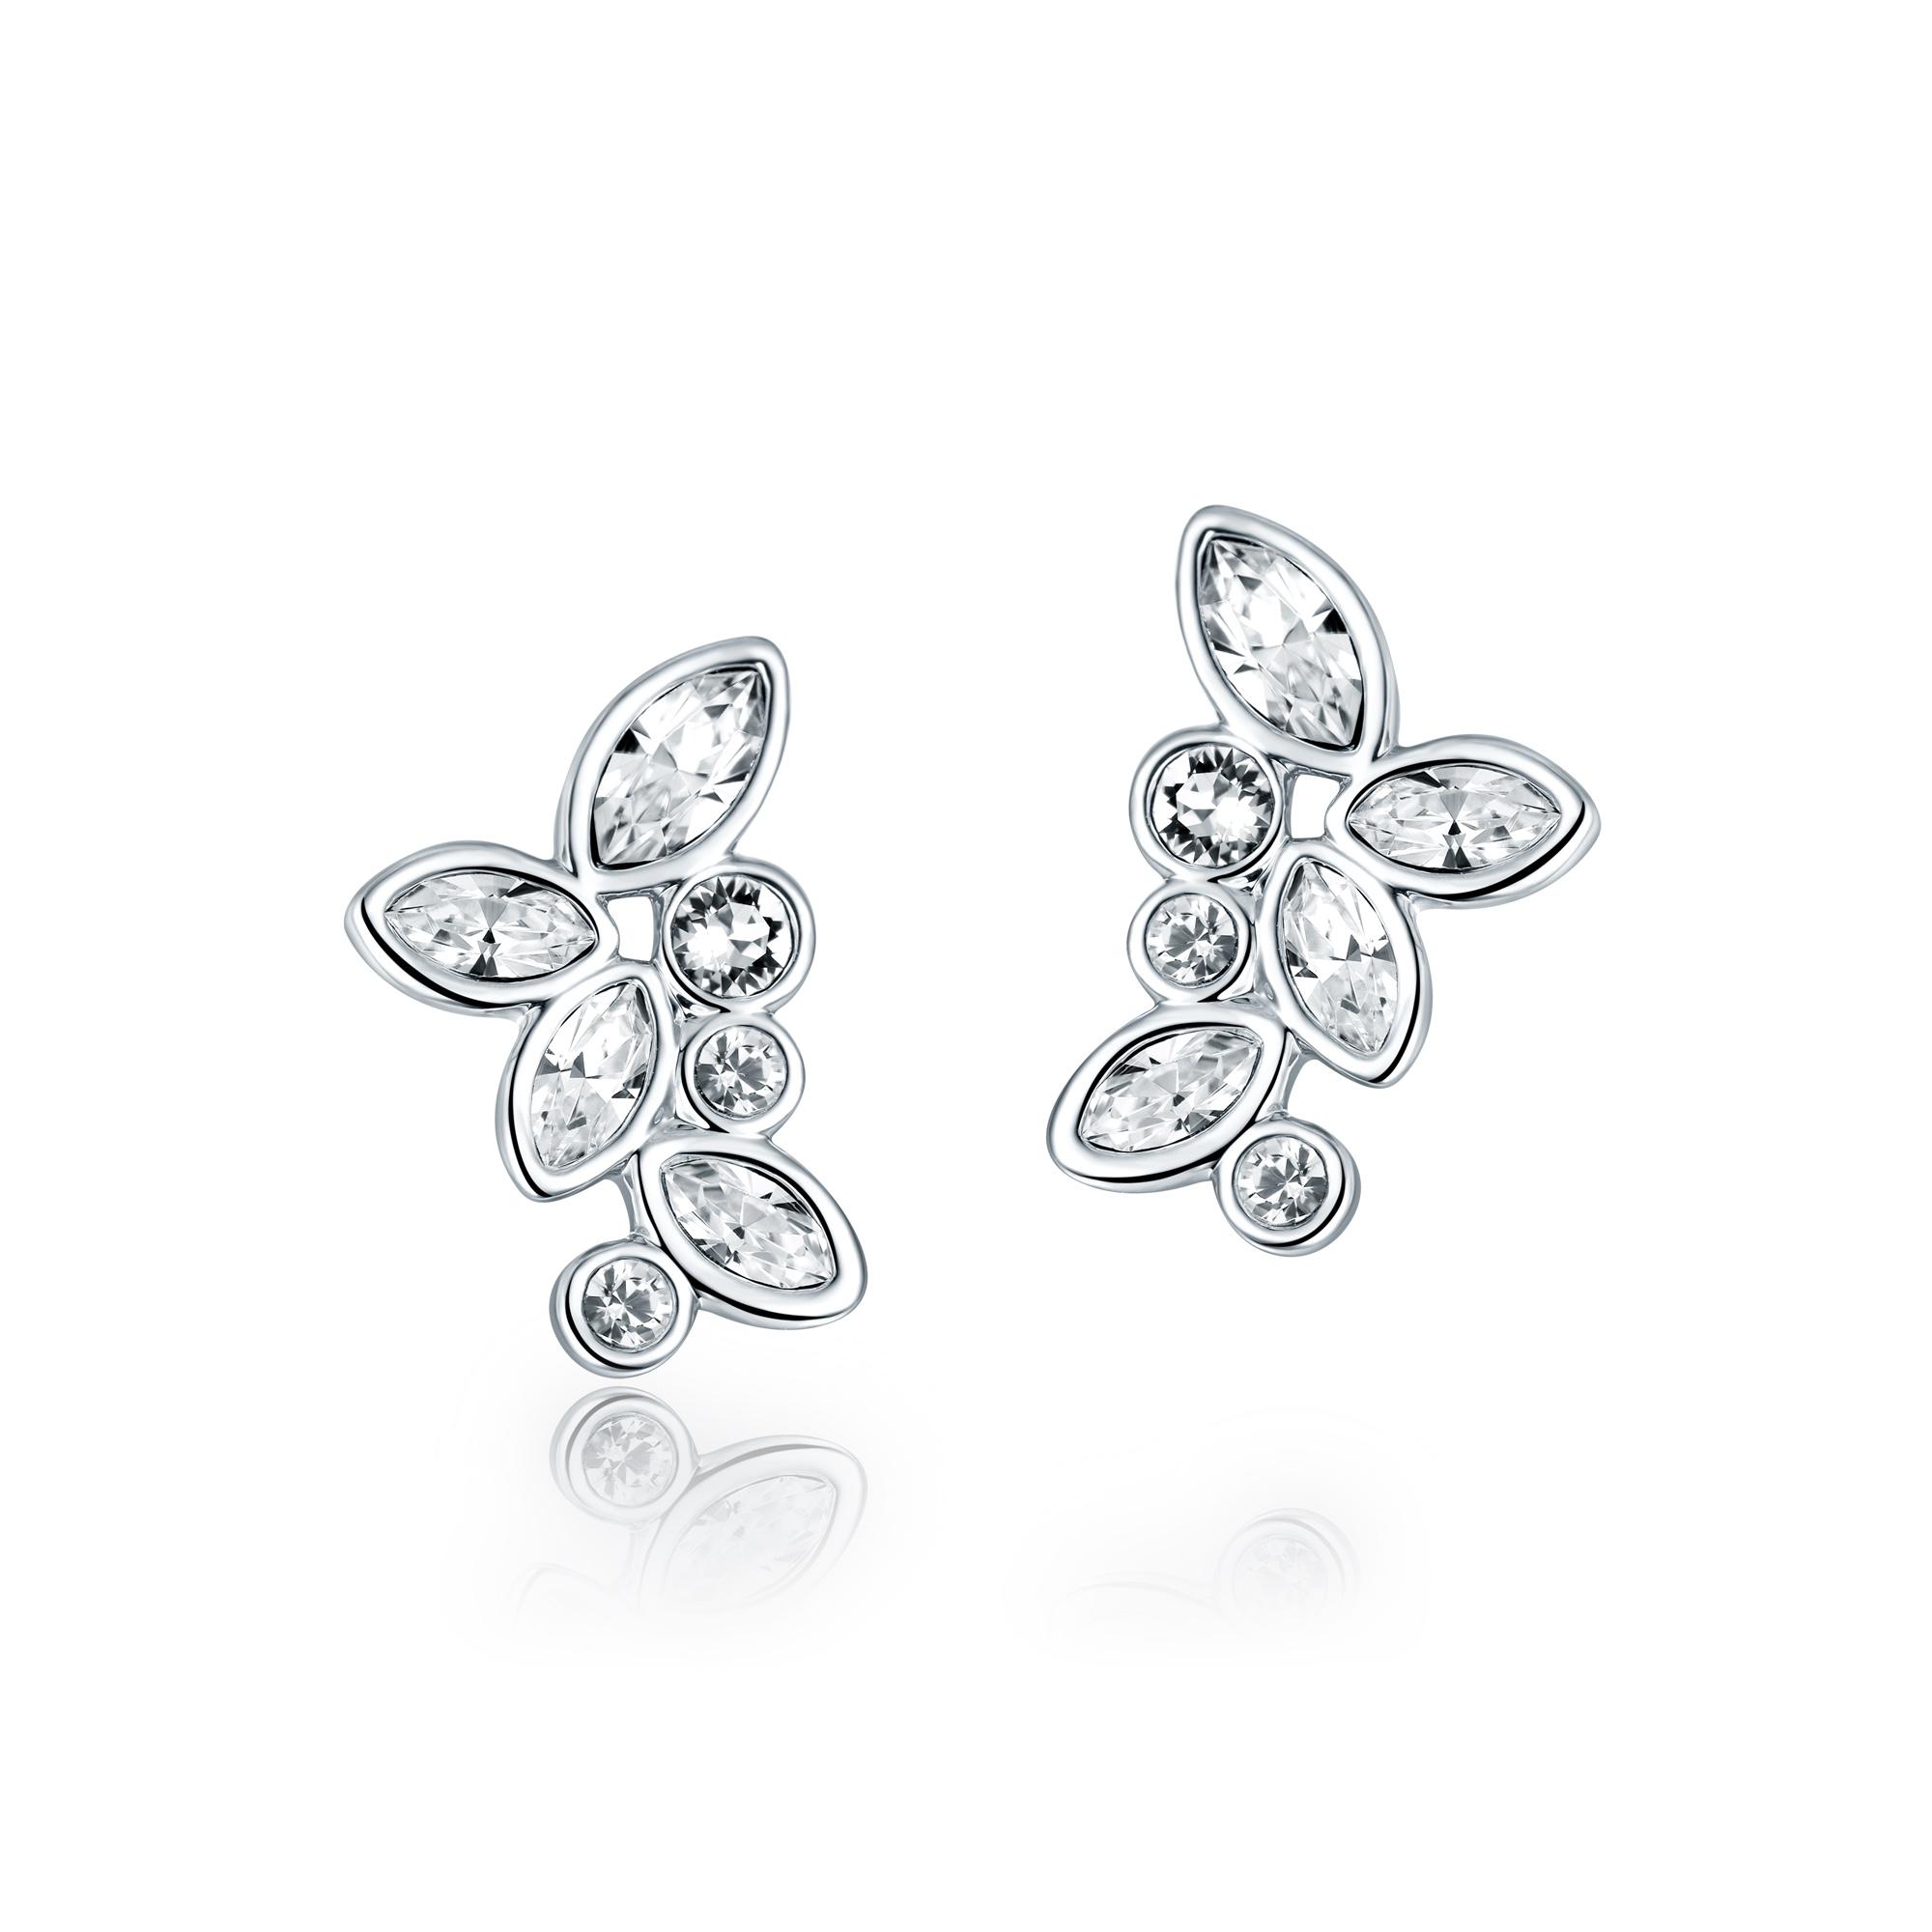 b909561aa Enchanted Stud Earrings with Swarovski® Crystals Rhodium Plated